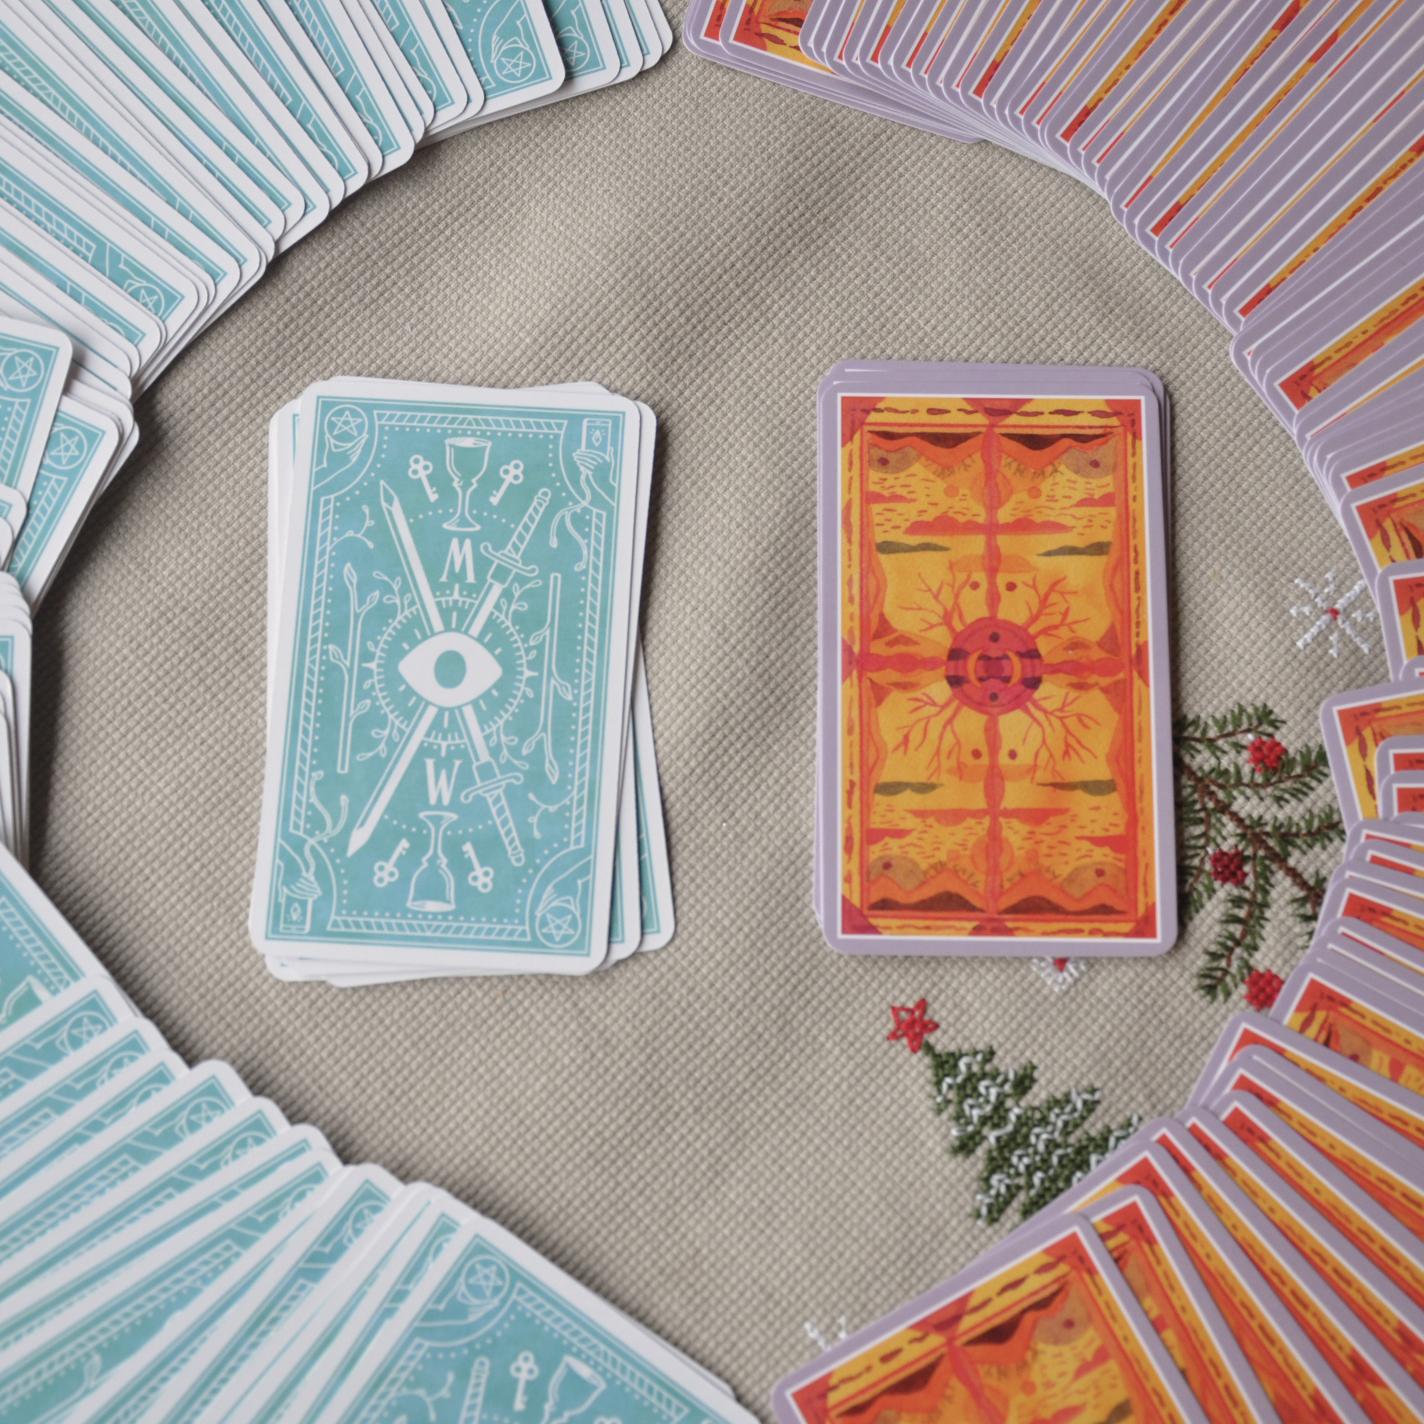 Modern Witch Tarot and The Cosmic Slumber Tarot